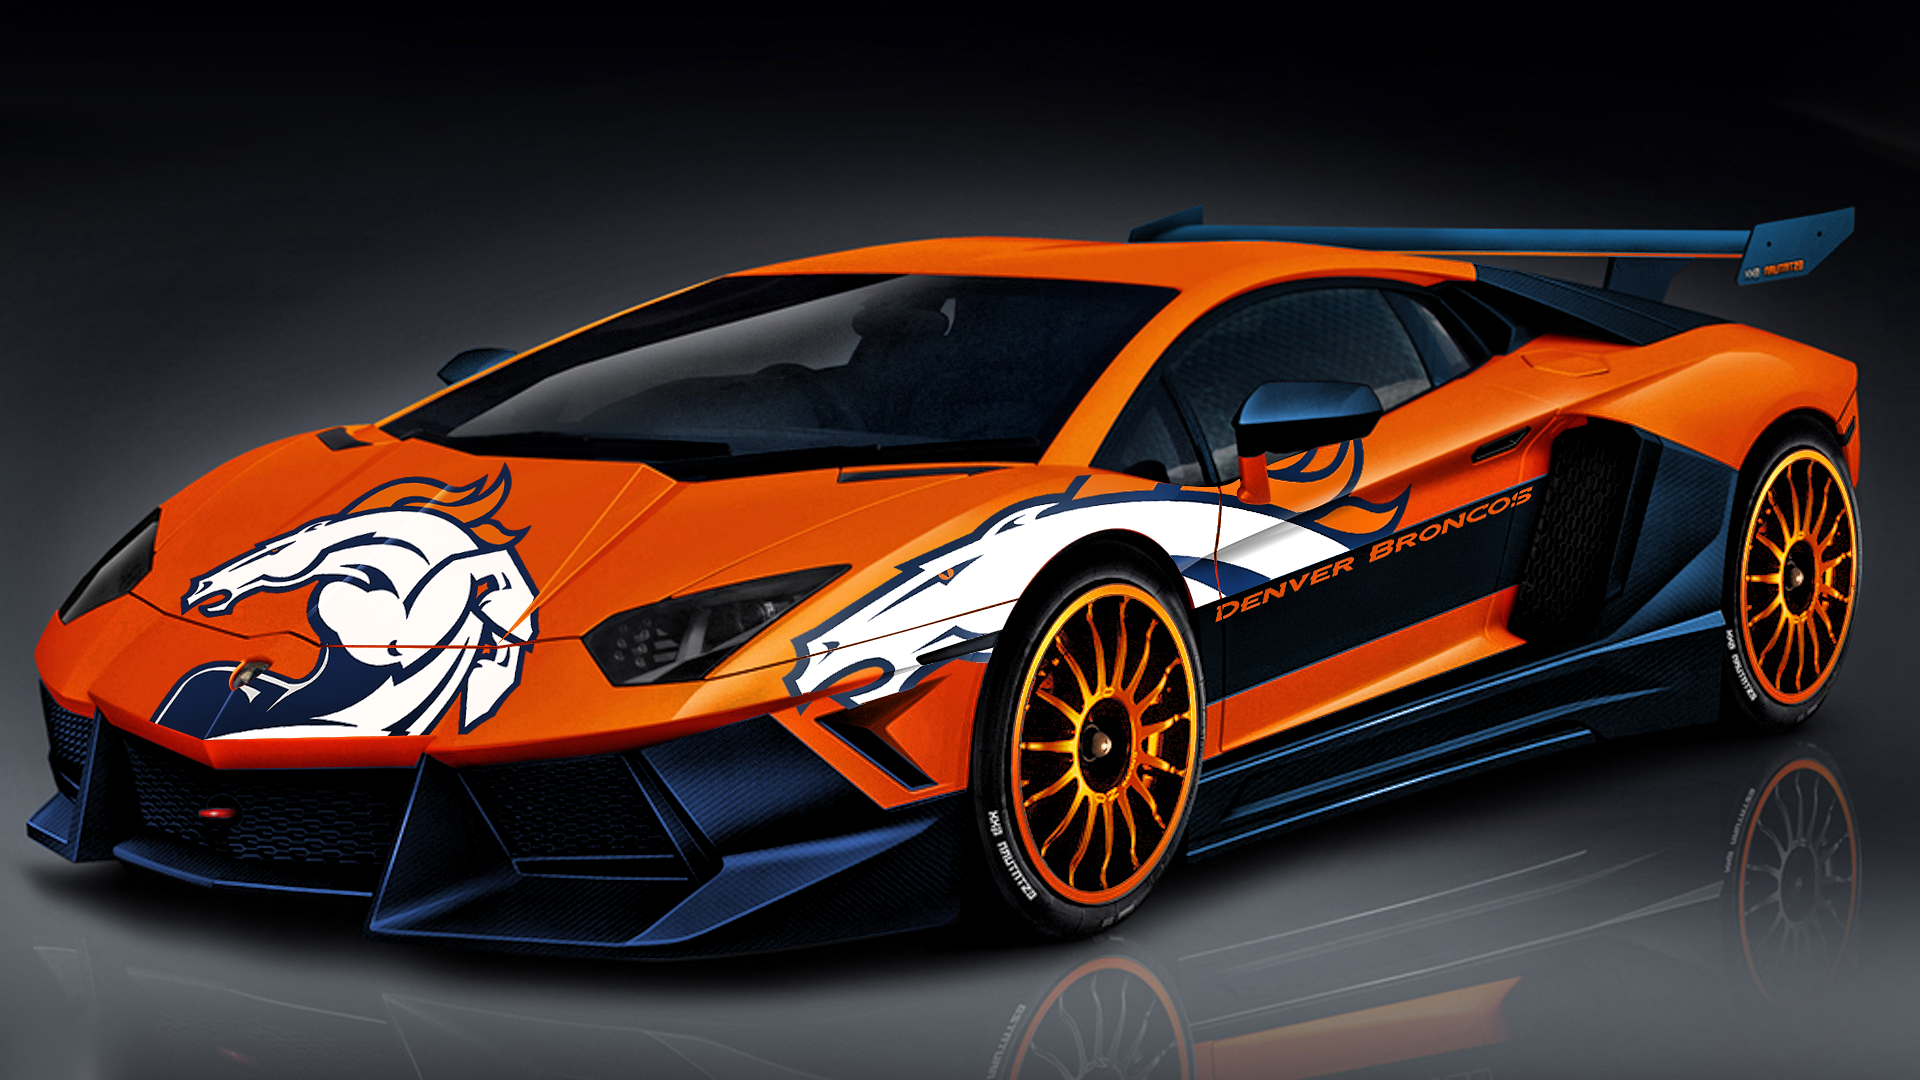 Broncos Lamborghini By Denversportswalls On Deviantart